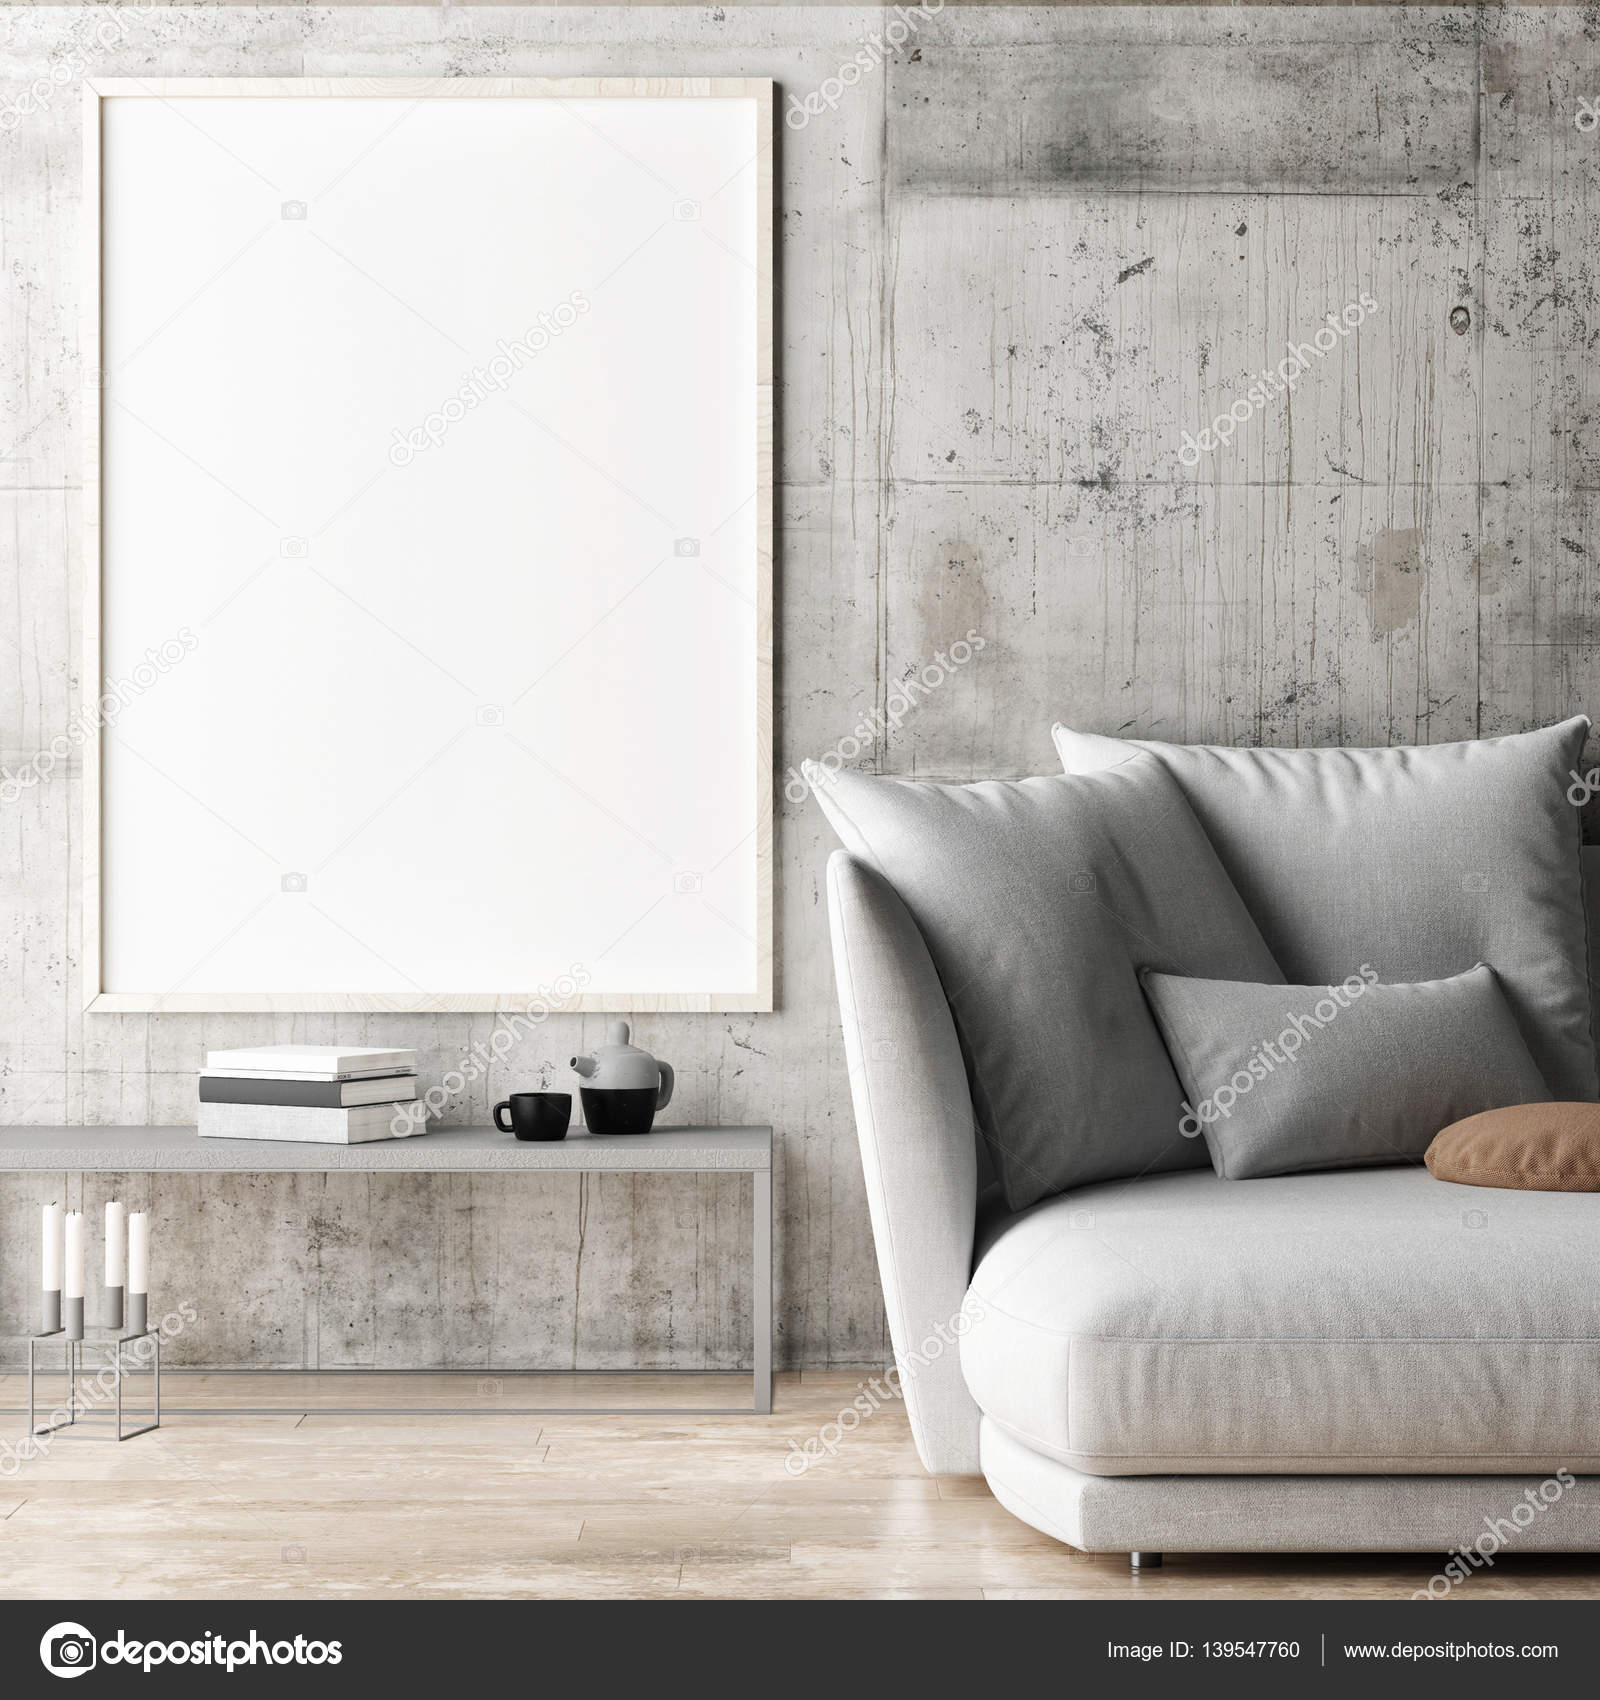 Gerahmte Poster in Hipster Wohnzimmer, 3d illustration — Stockfoto ...